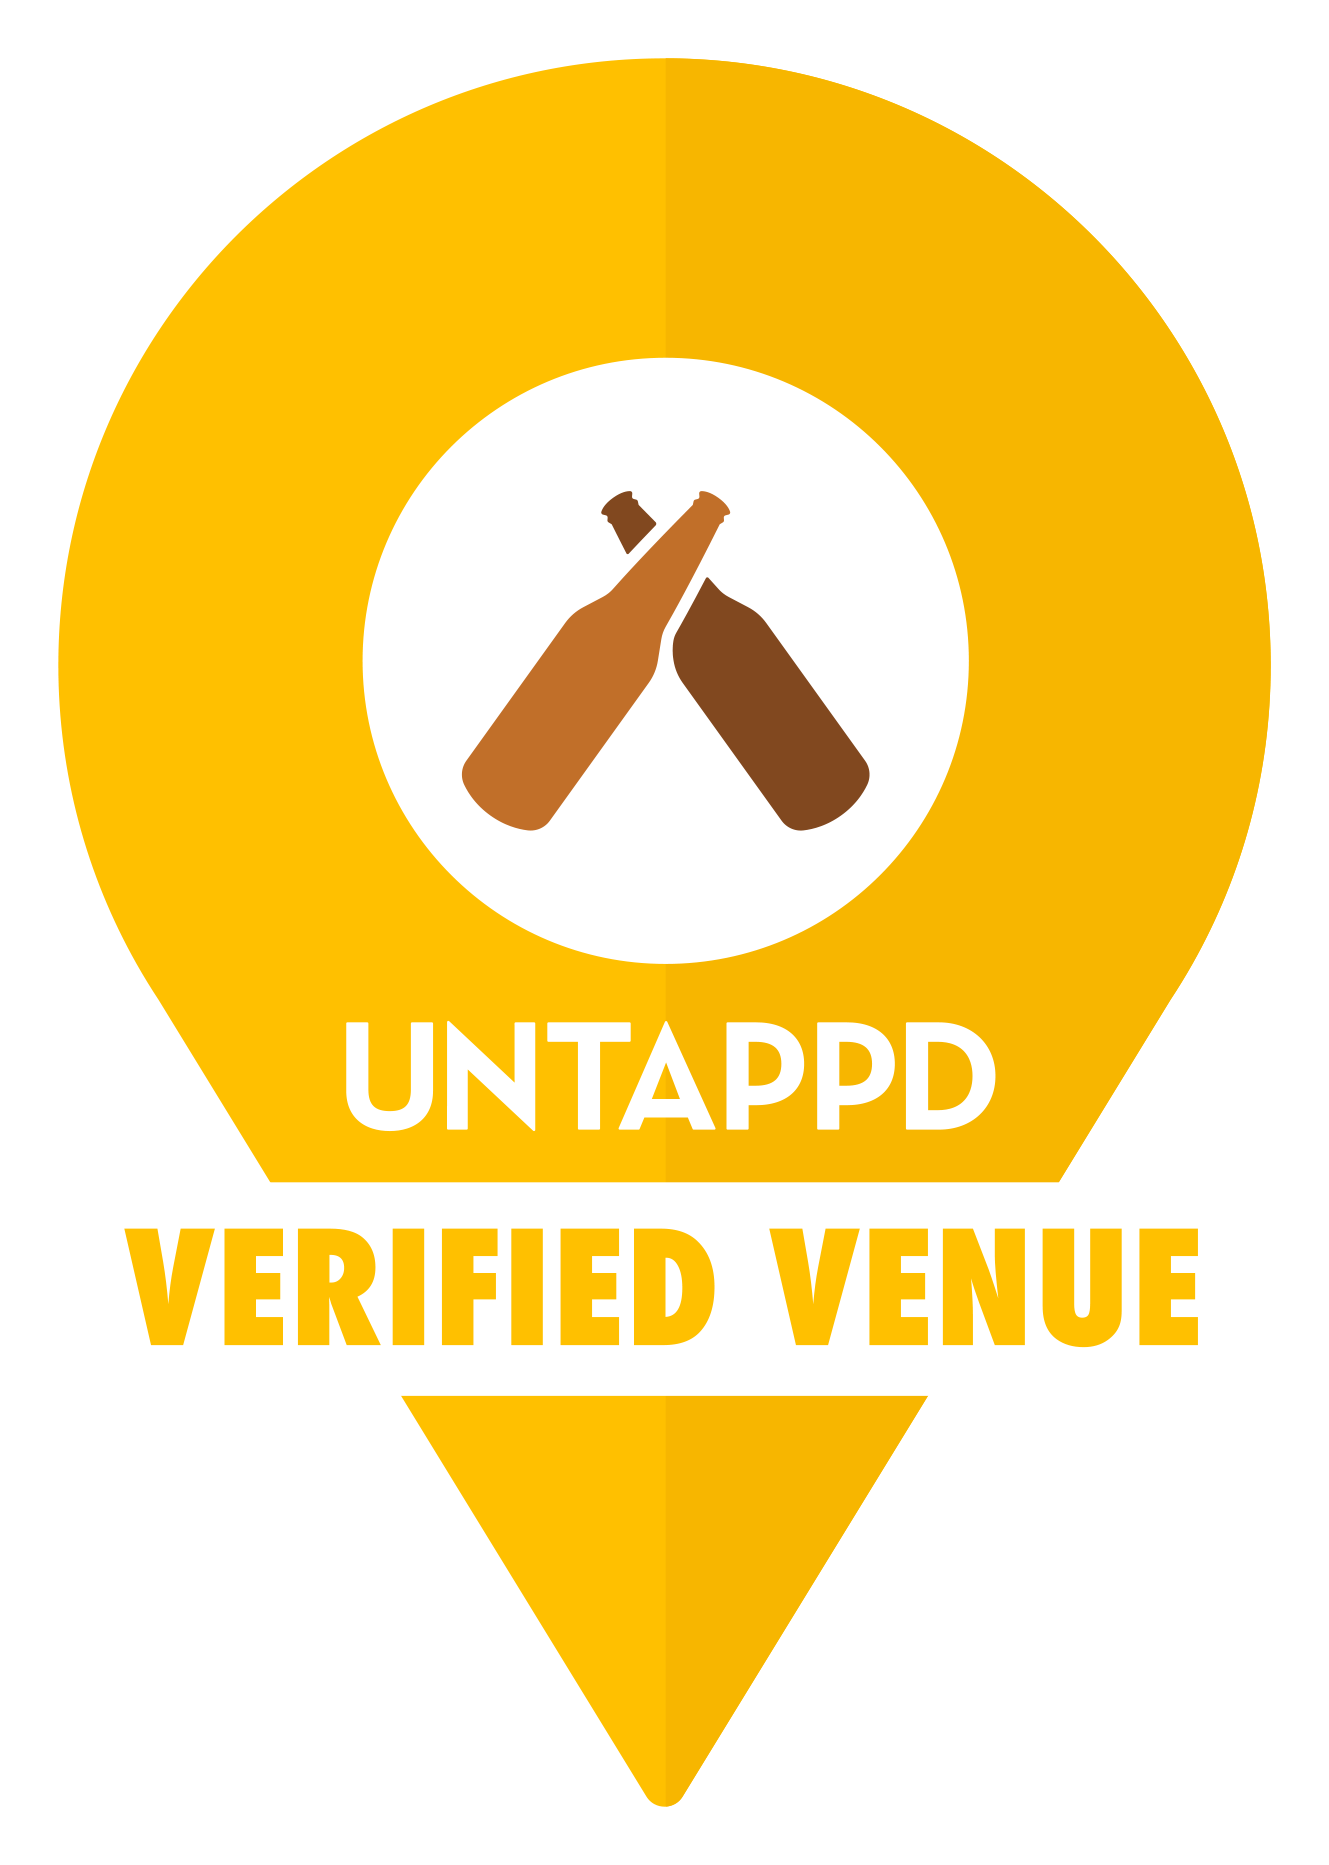 Untappd - Verified Venue